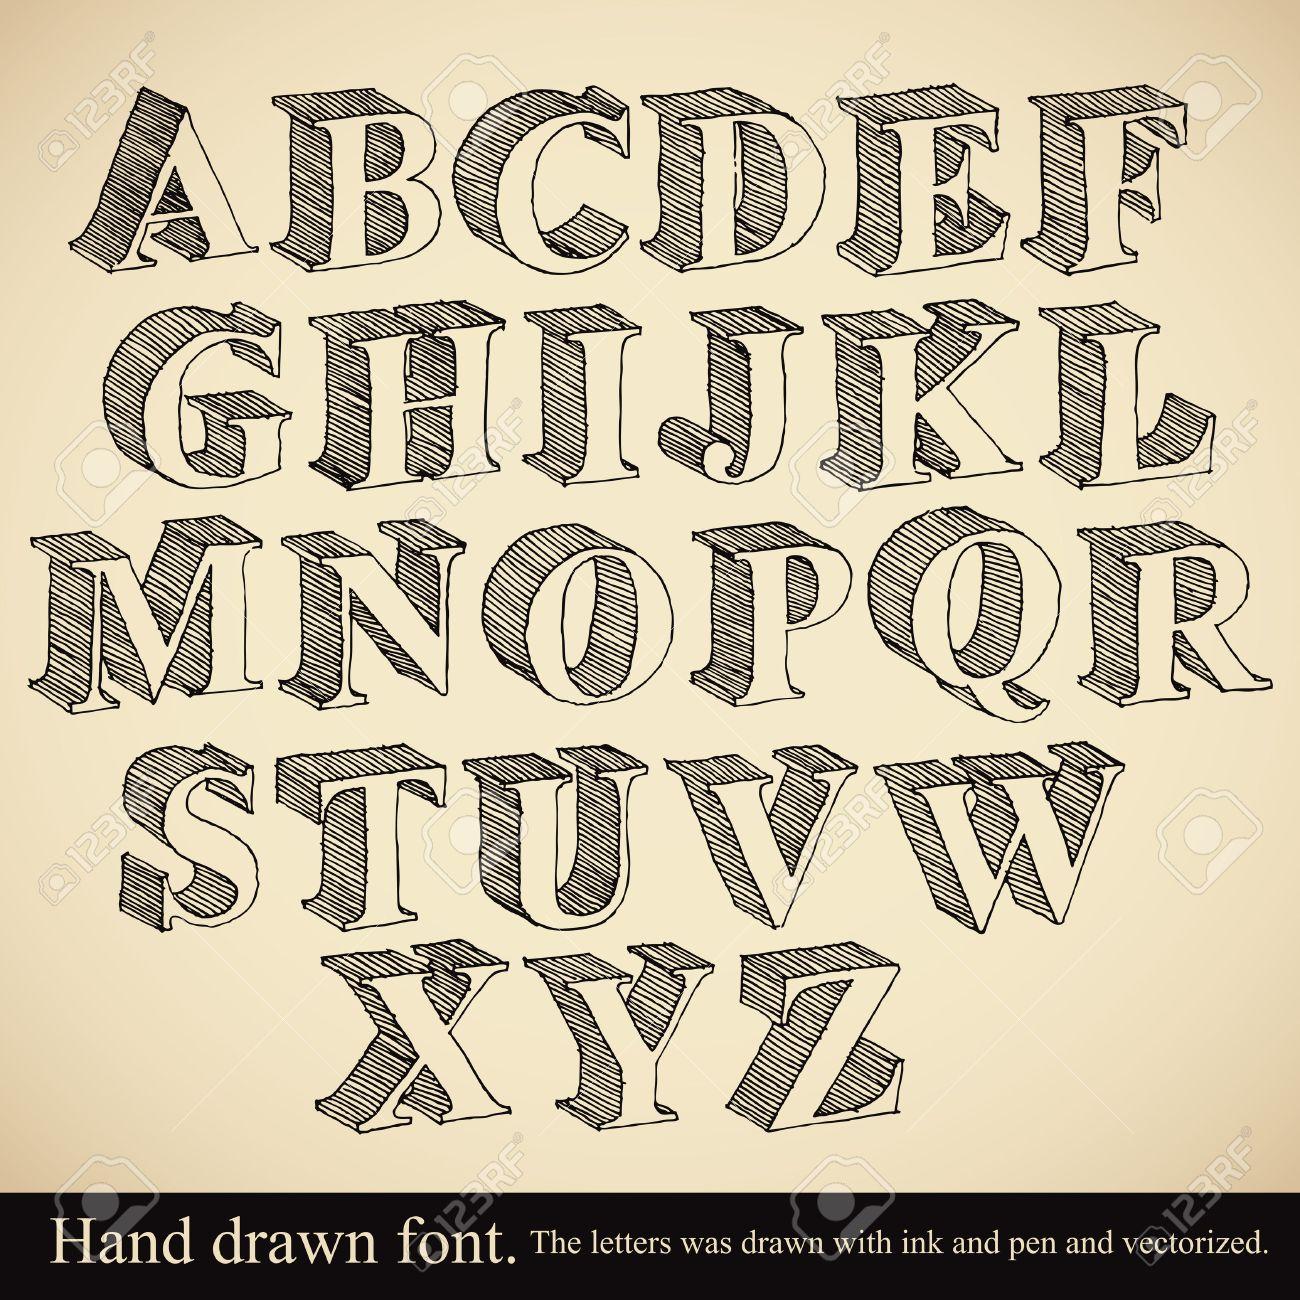 Hand drawn 3d font, vector alphabet vintage style. Stock Vector - 32660592